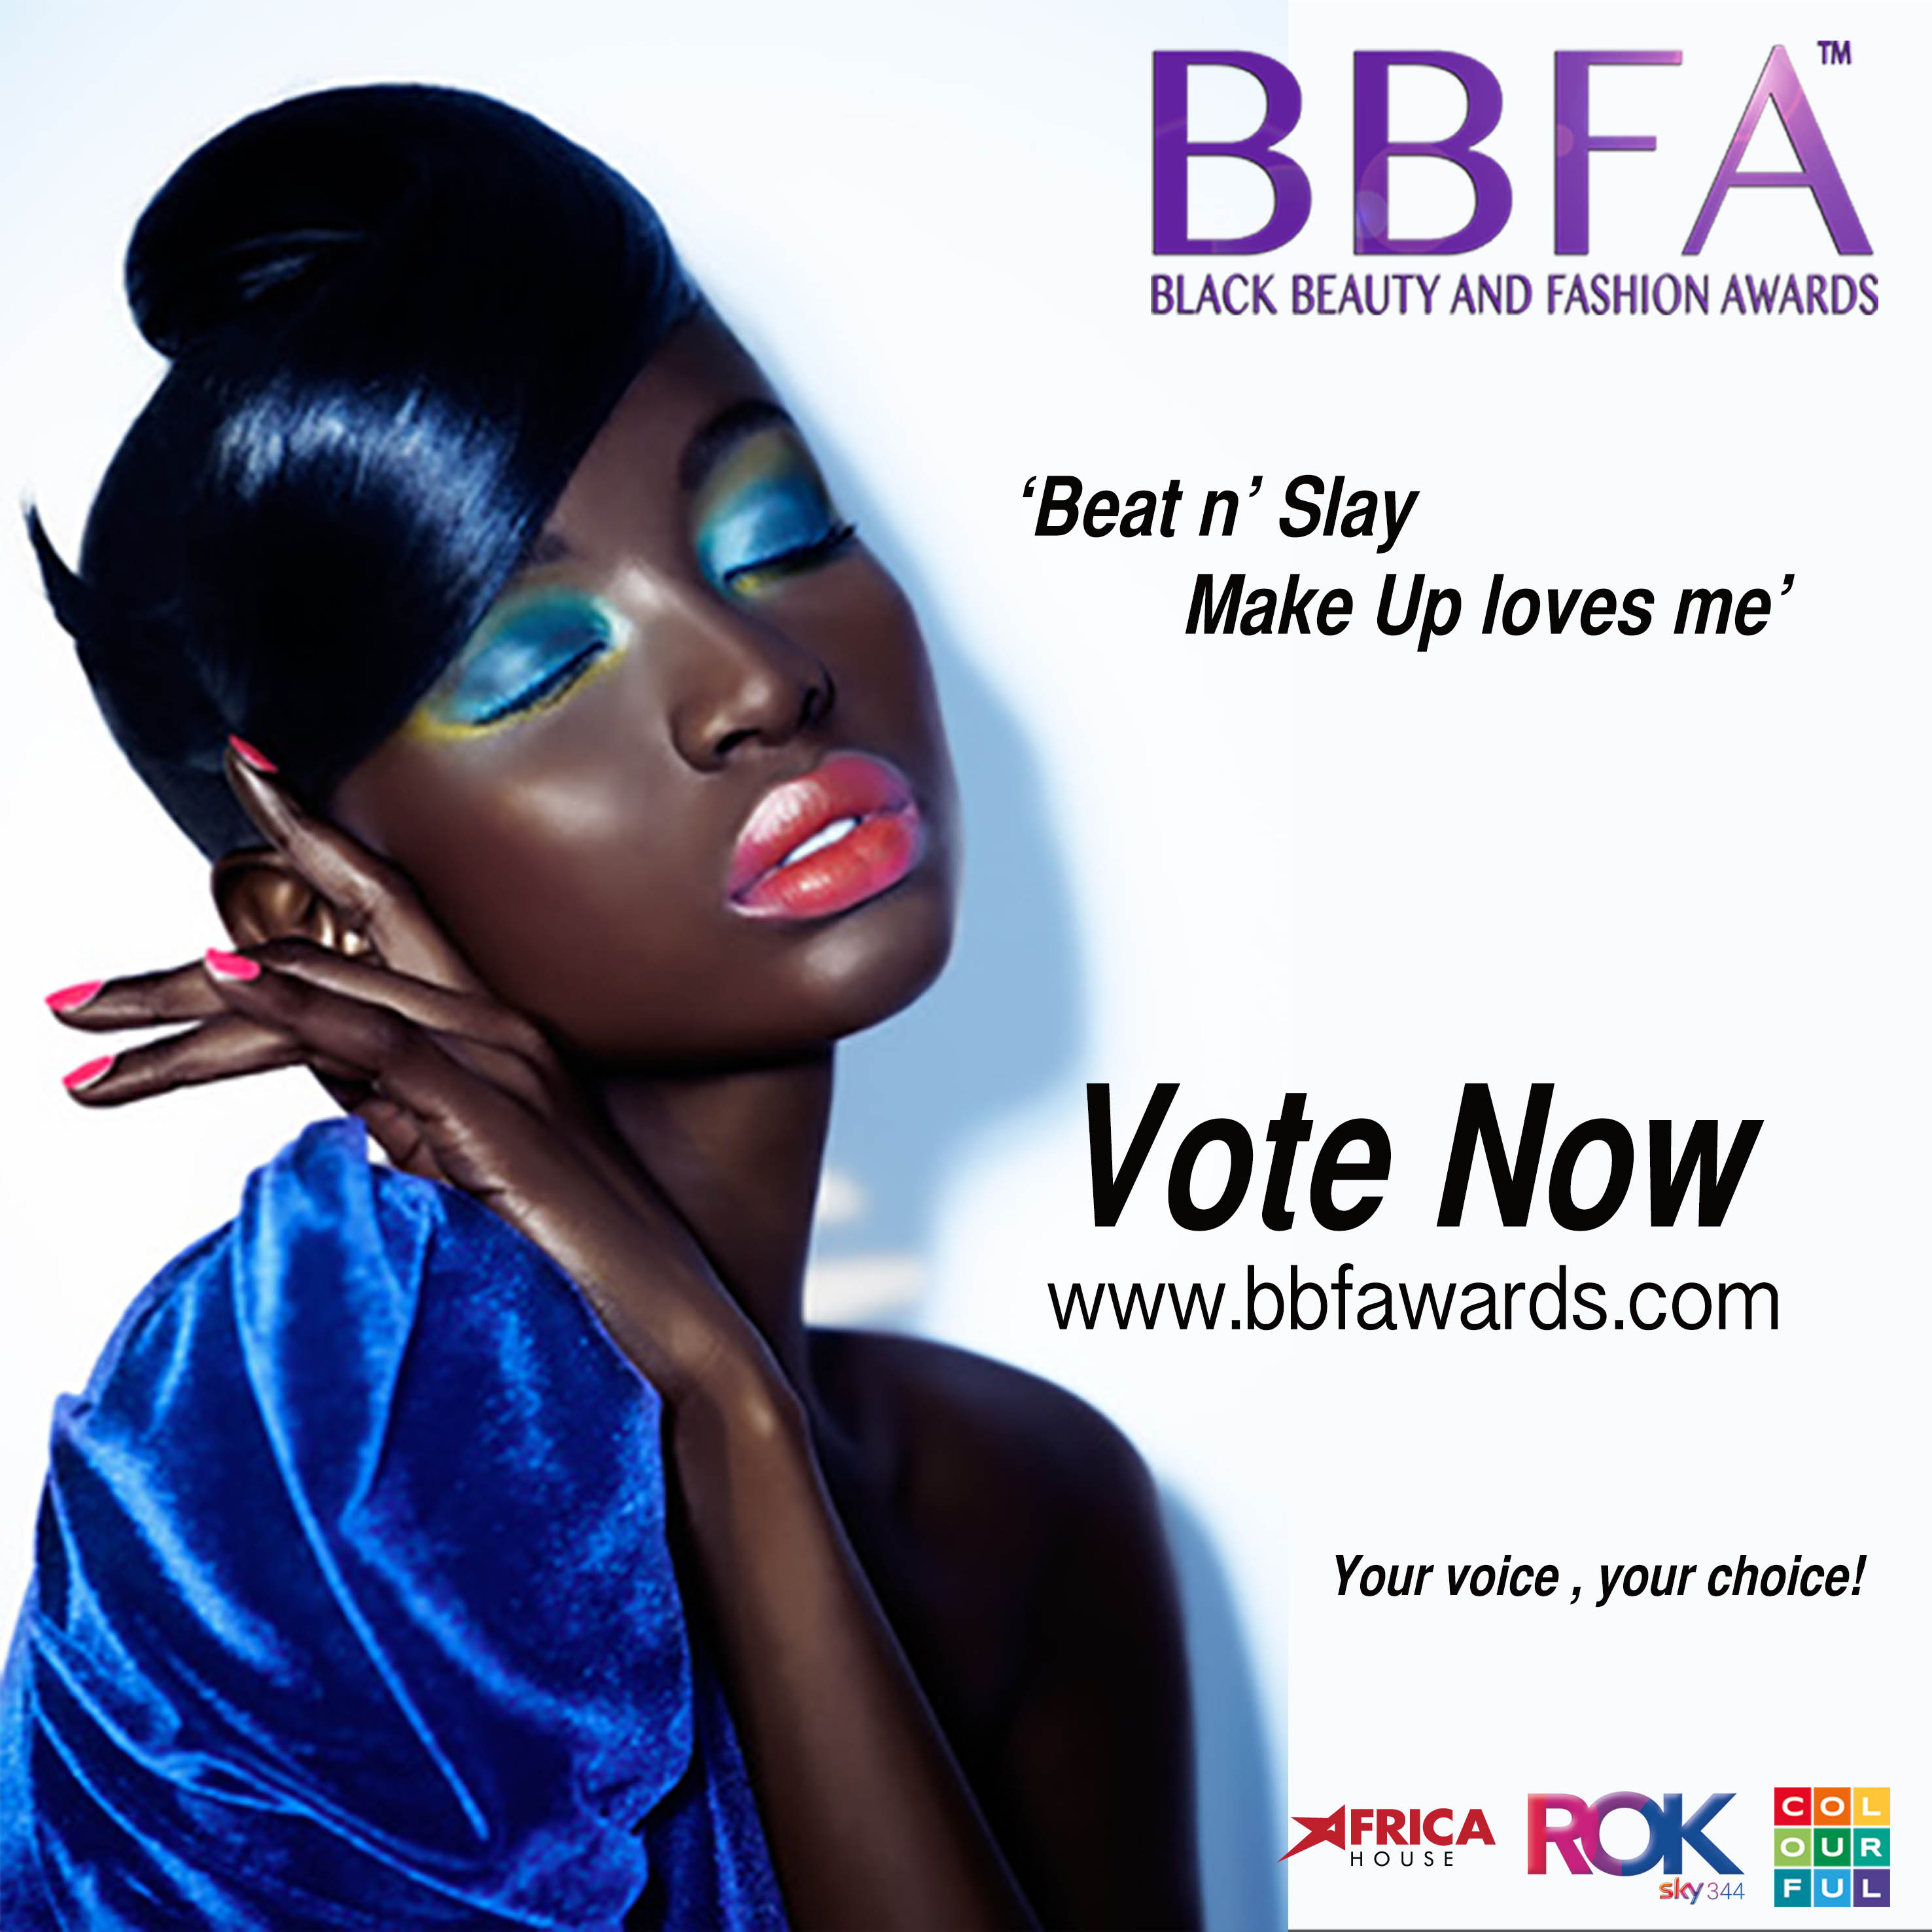 Fashion Beauty Awards 2017: Black Beauty And Fashion Awards 2017